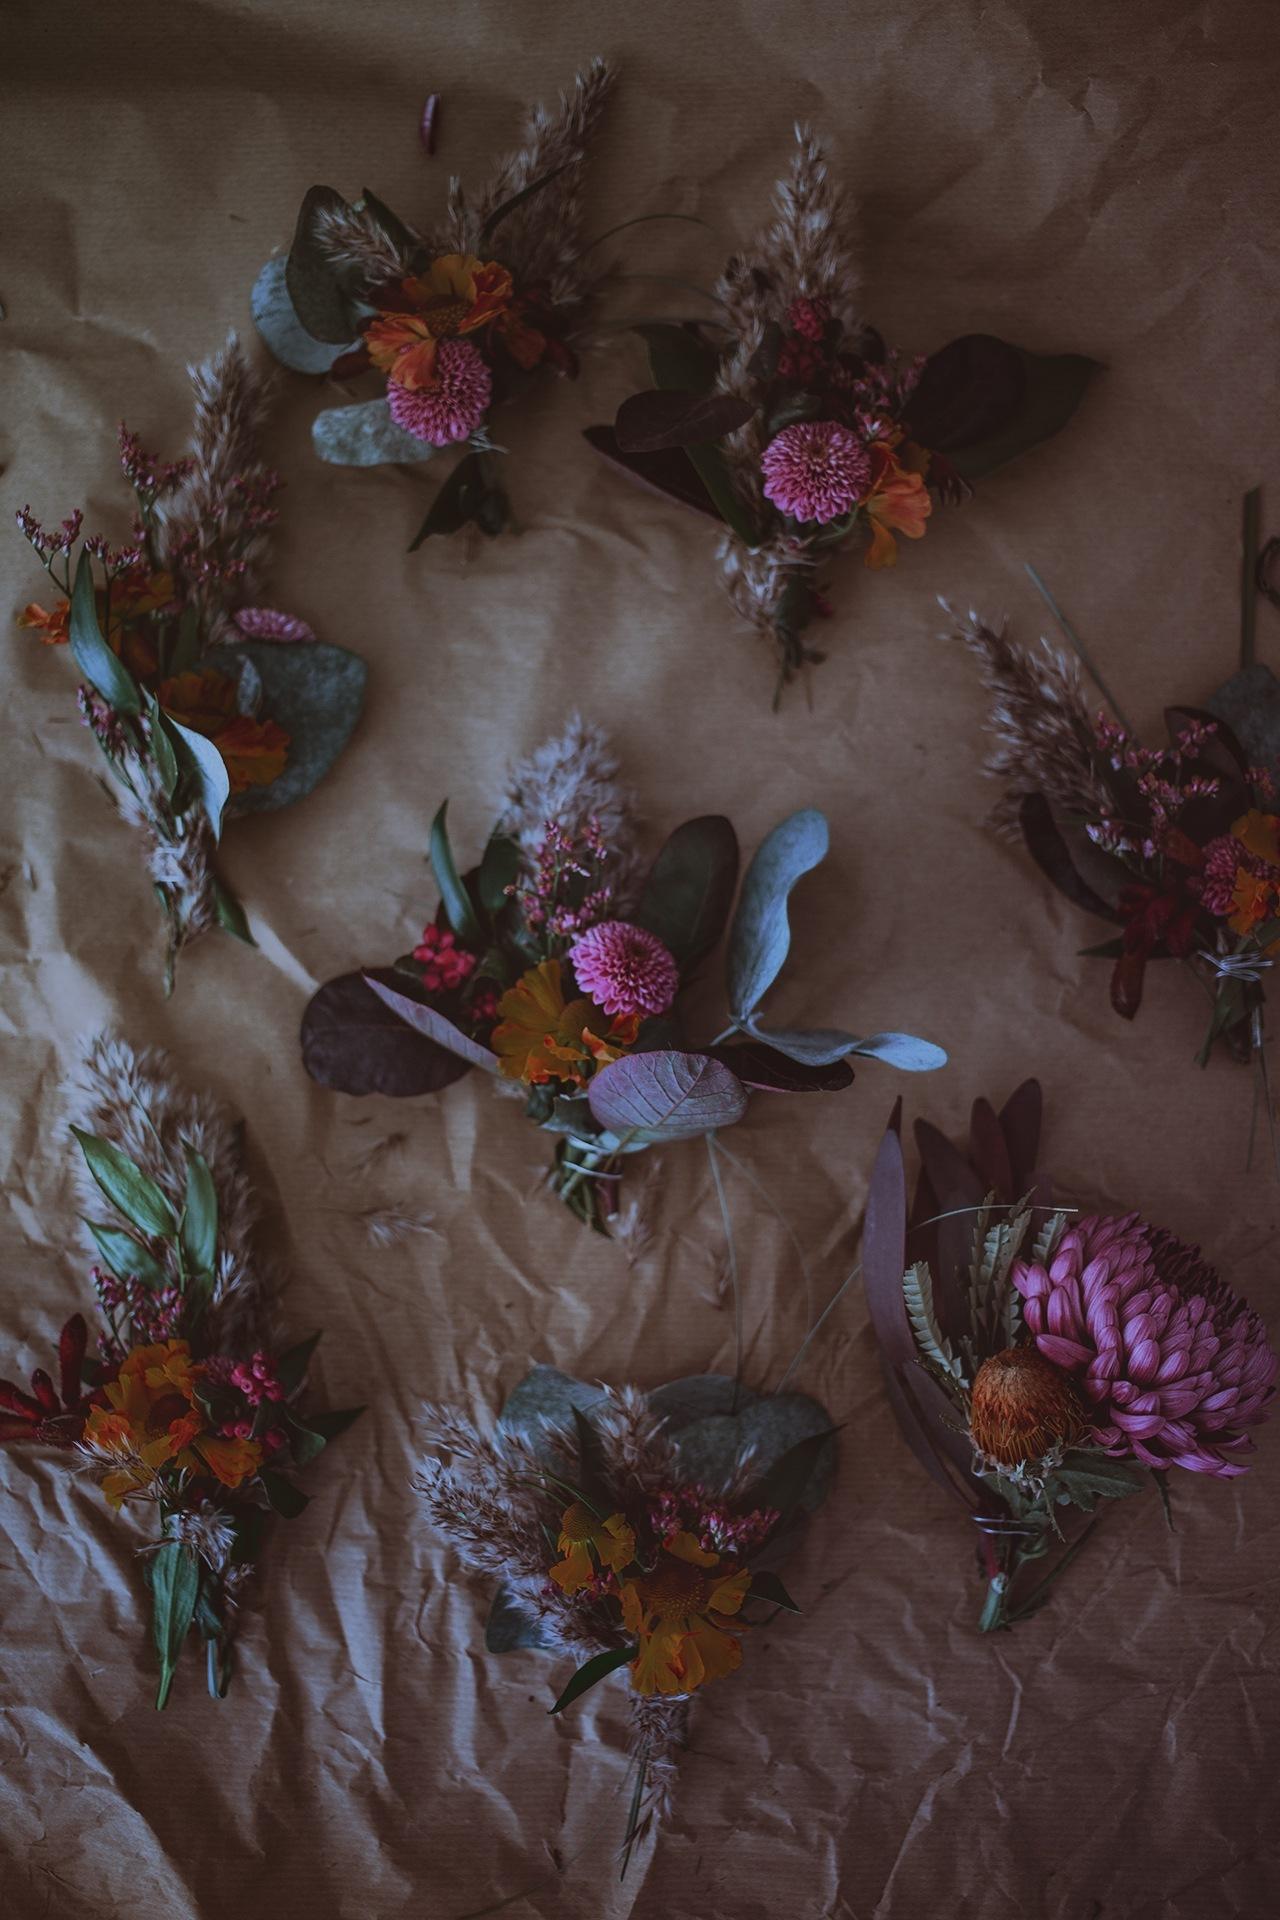 Dark & Moody Flowers by Christina Greve